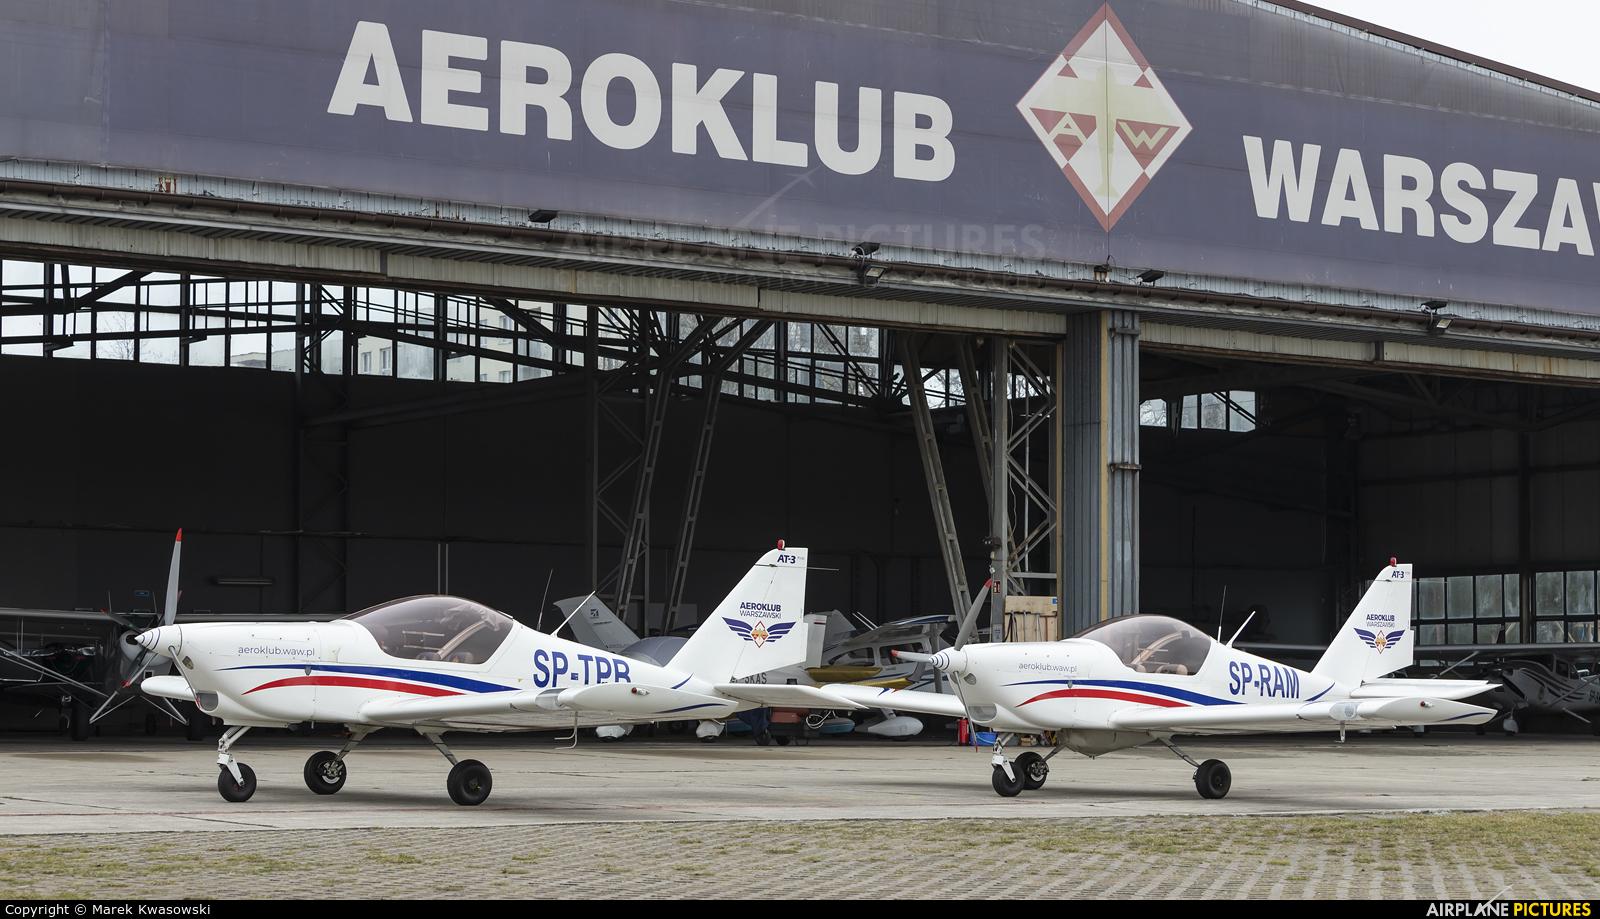 Aeroklub Warszawski SP-TPB aircraft at Warsaw - Babice